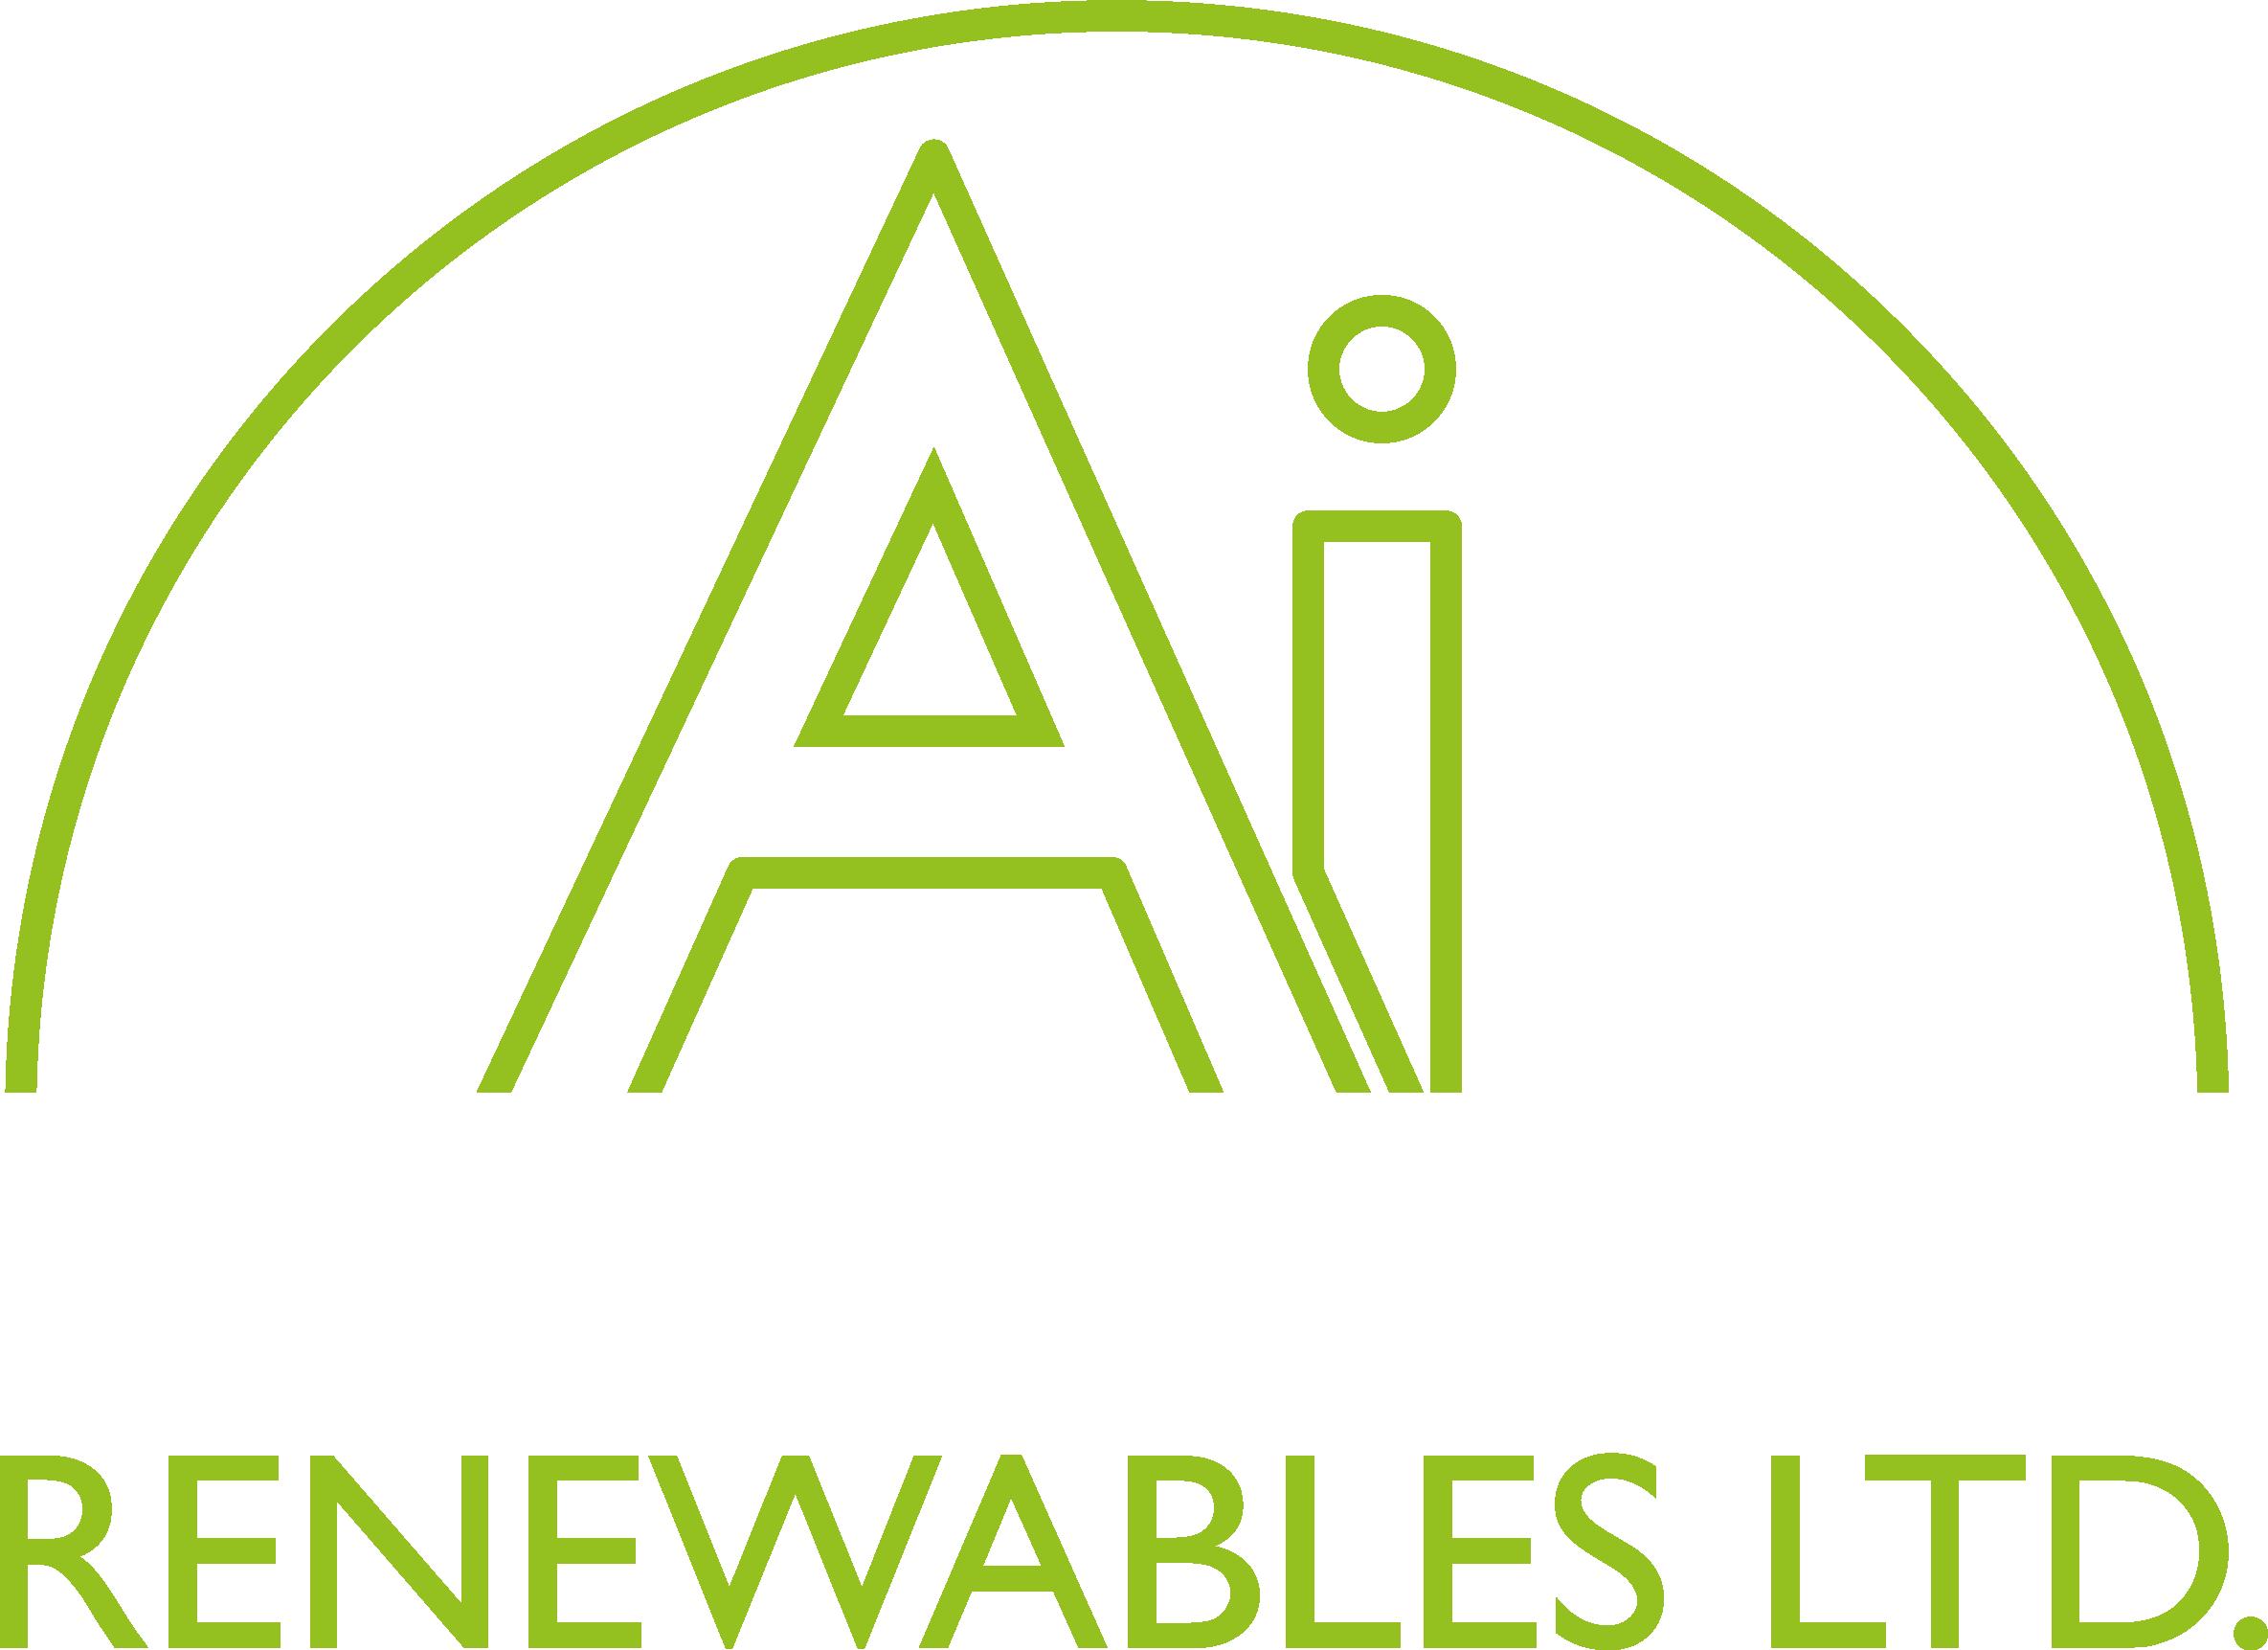 AI Electrical & Renewables Ltd